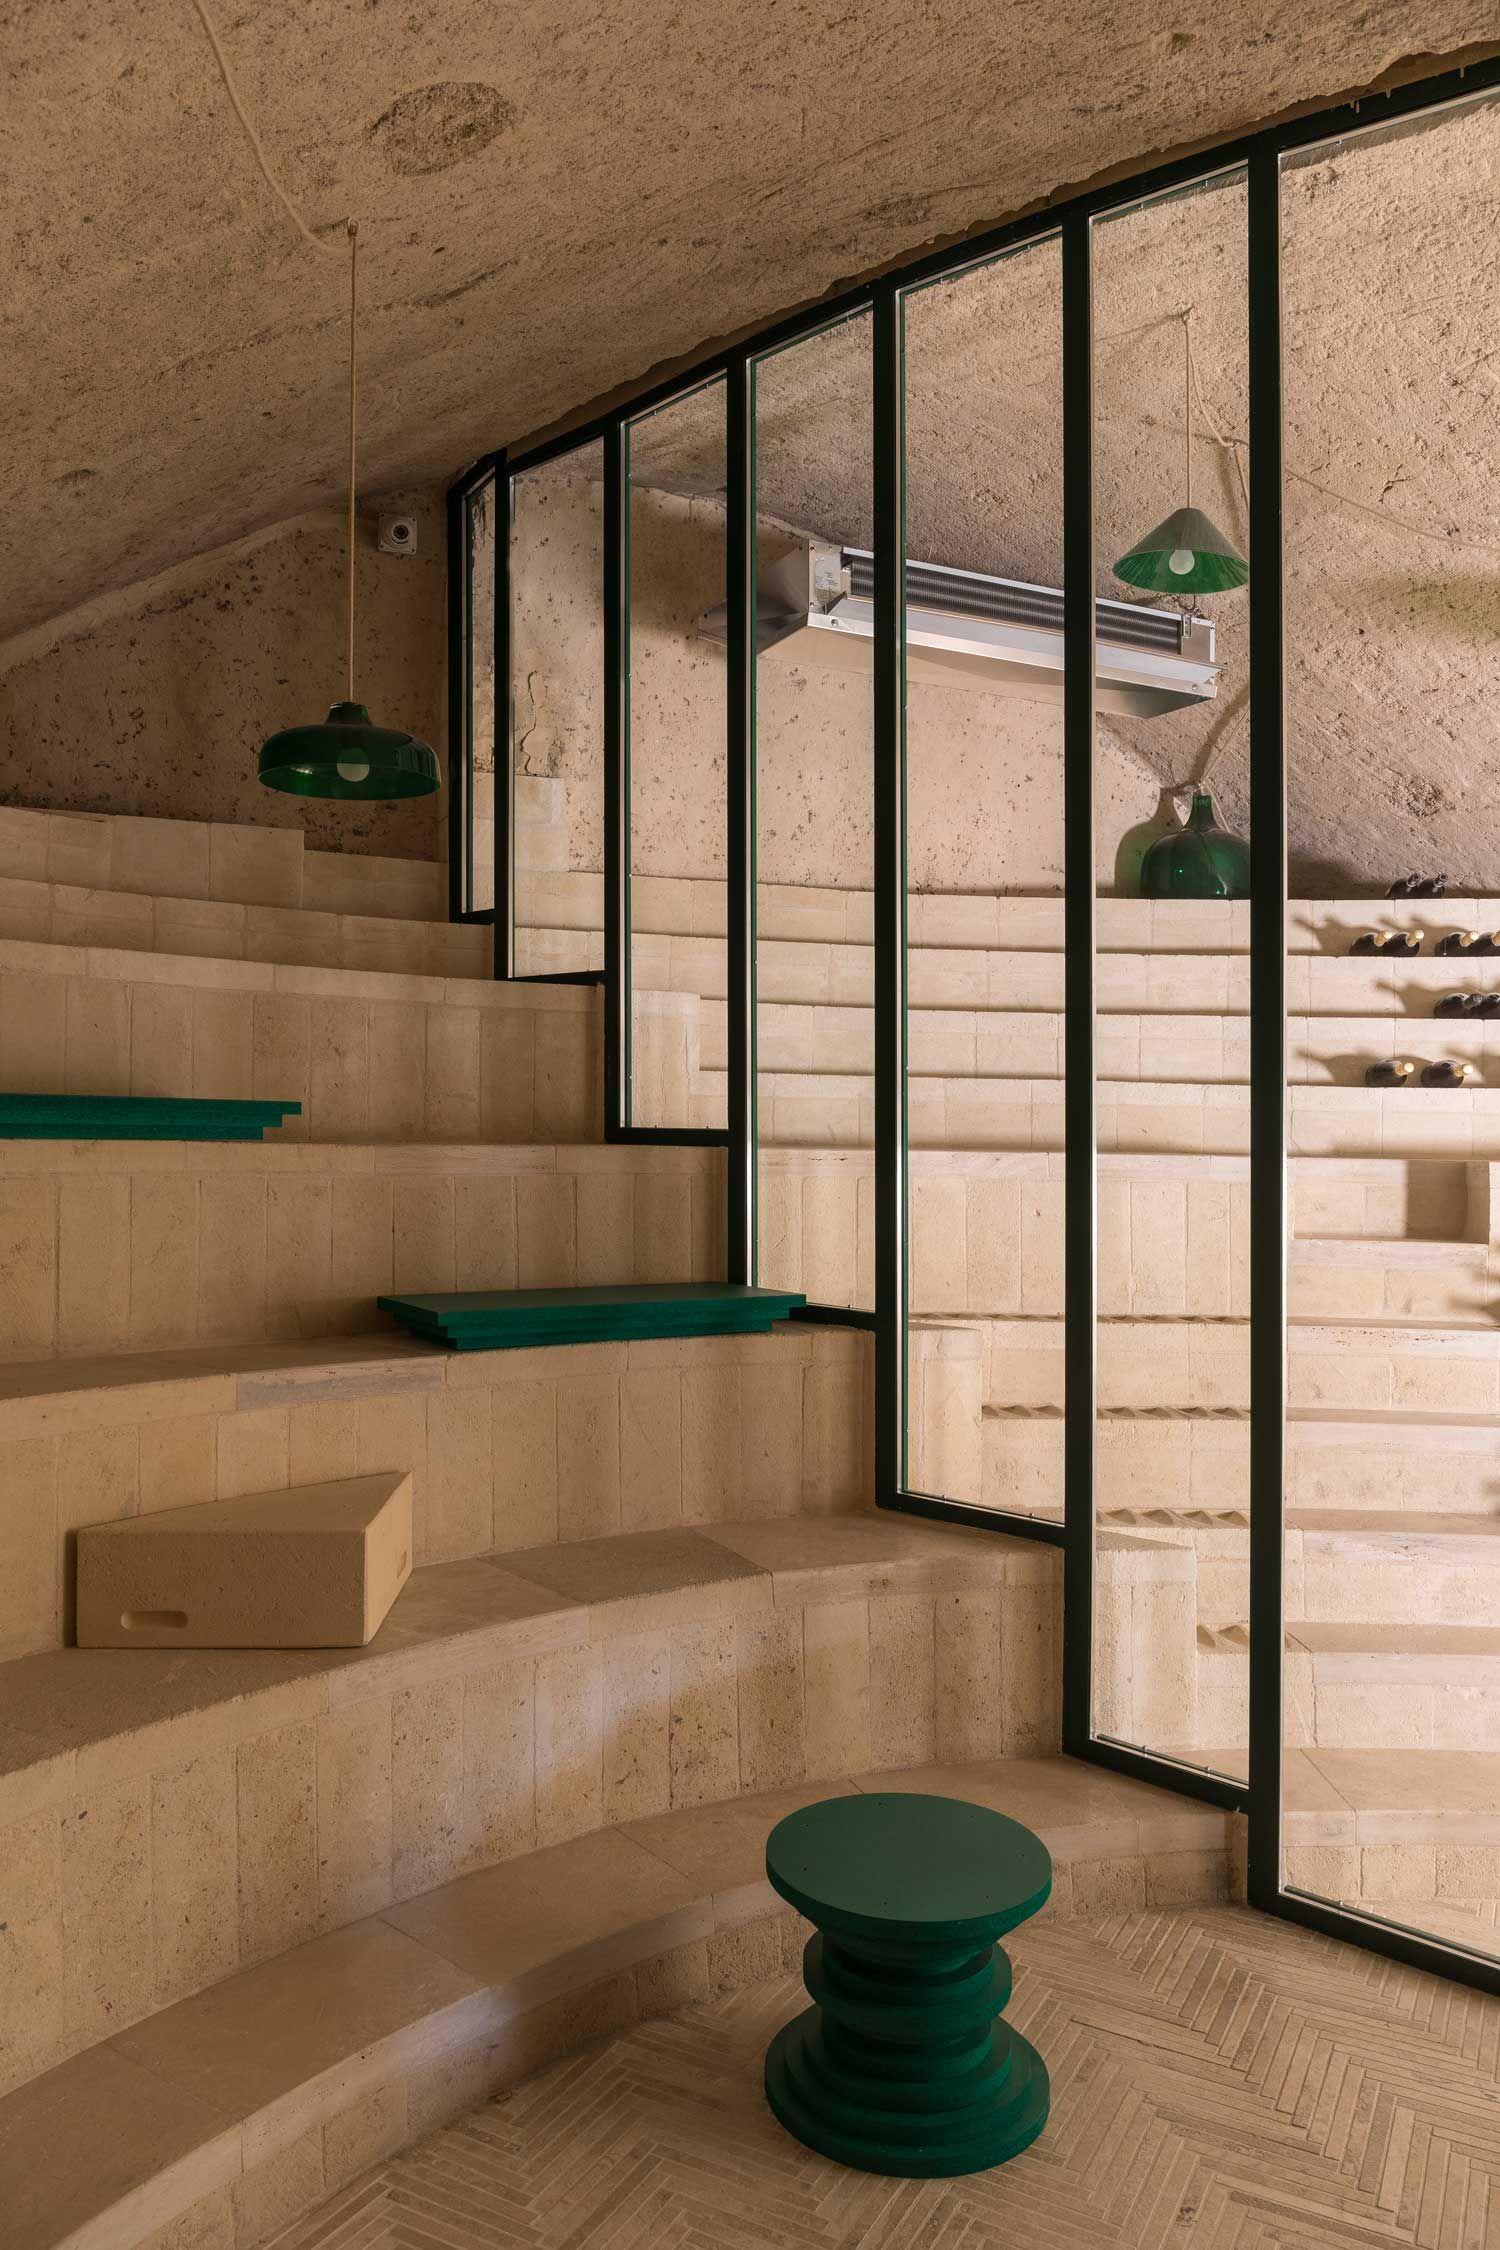 Enoteca Dai Tosi In Matera Italy By Architecten De Vylder Vinck Taillieu Architecture Architecture Building Italian Village